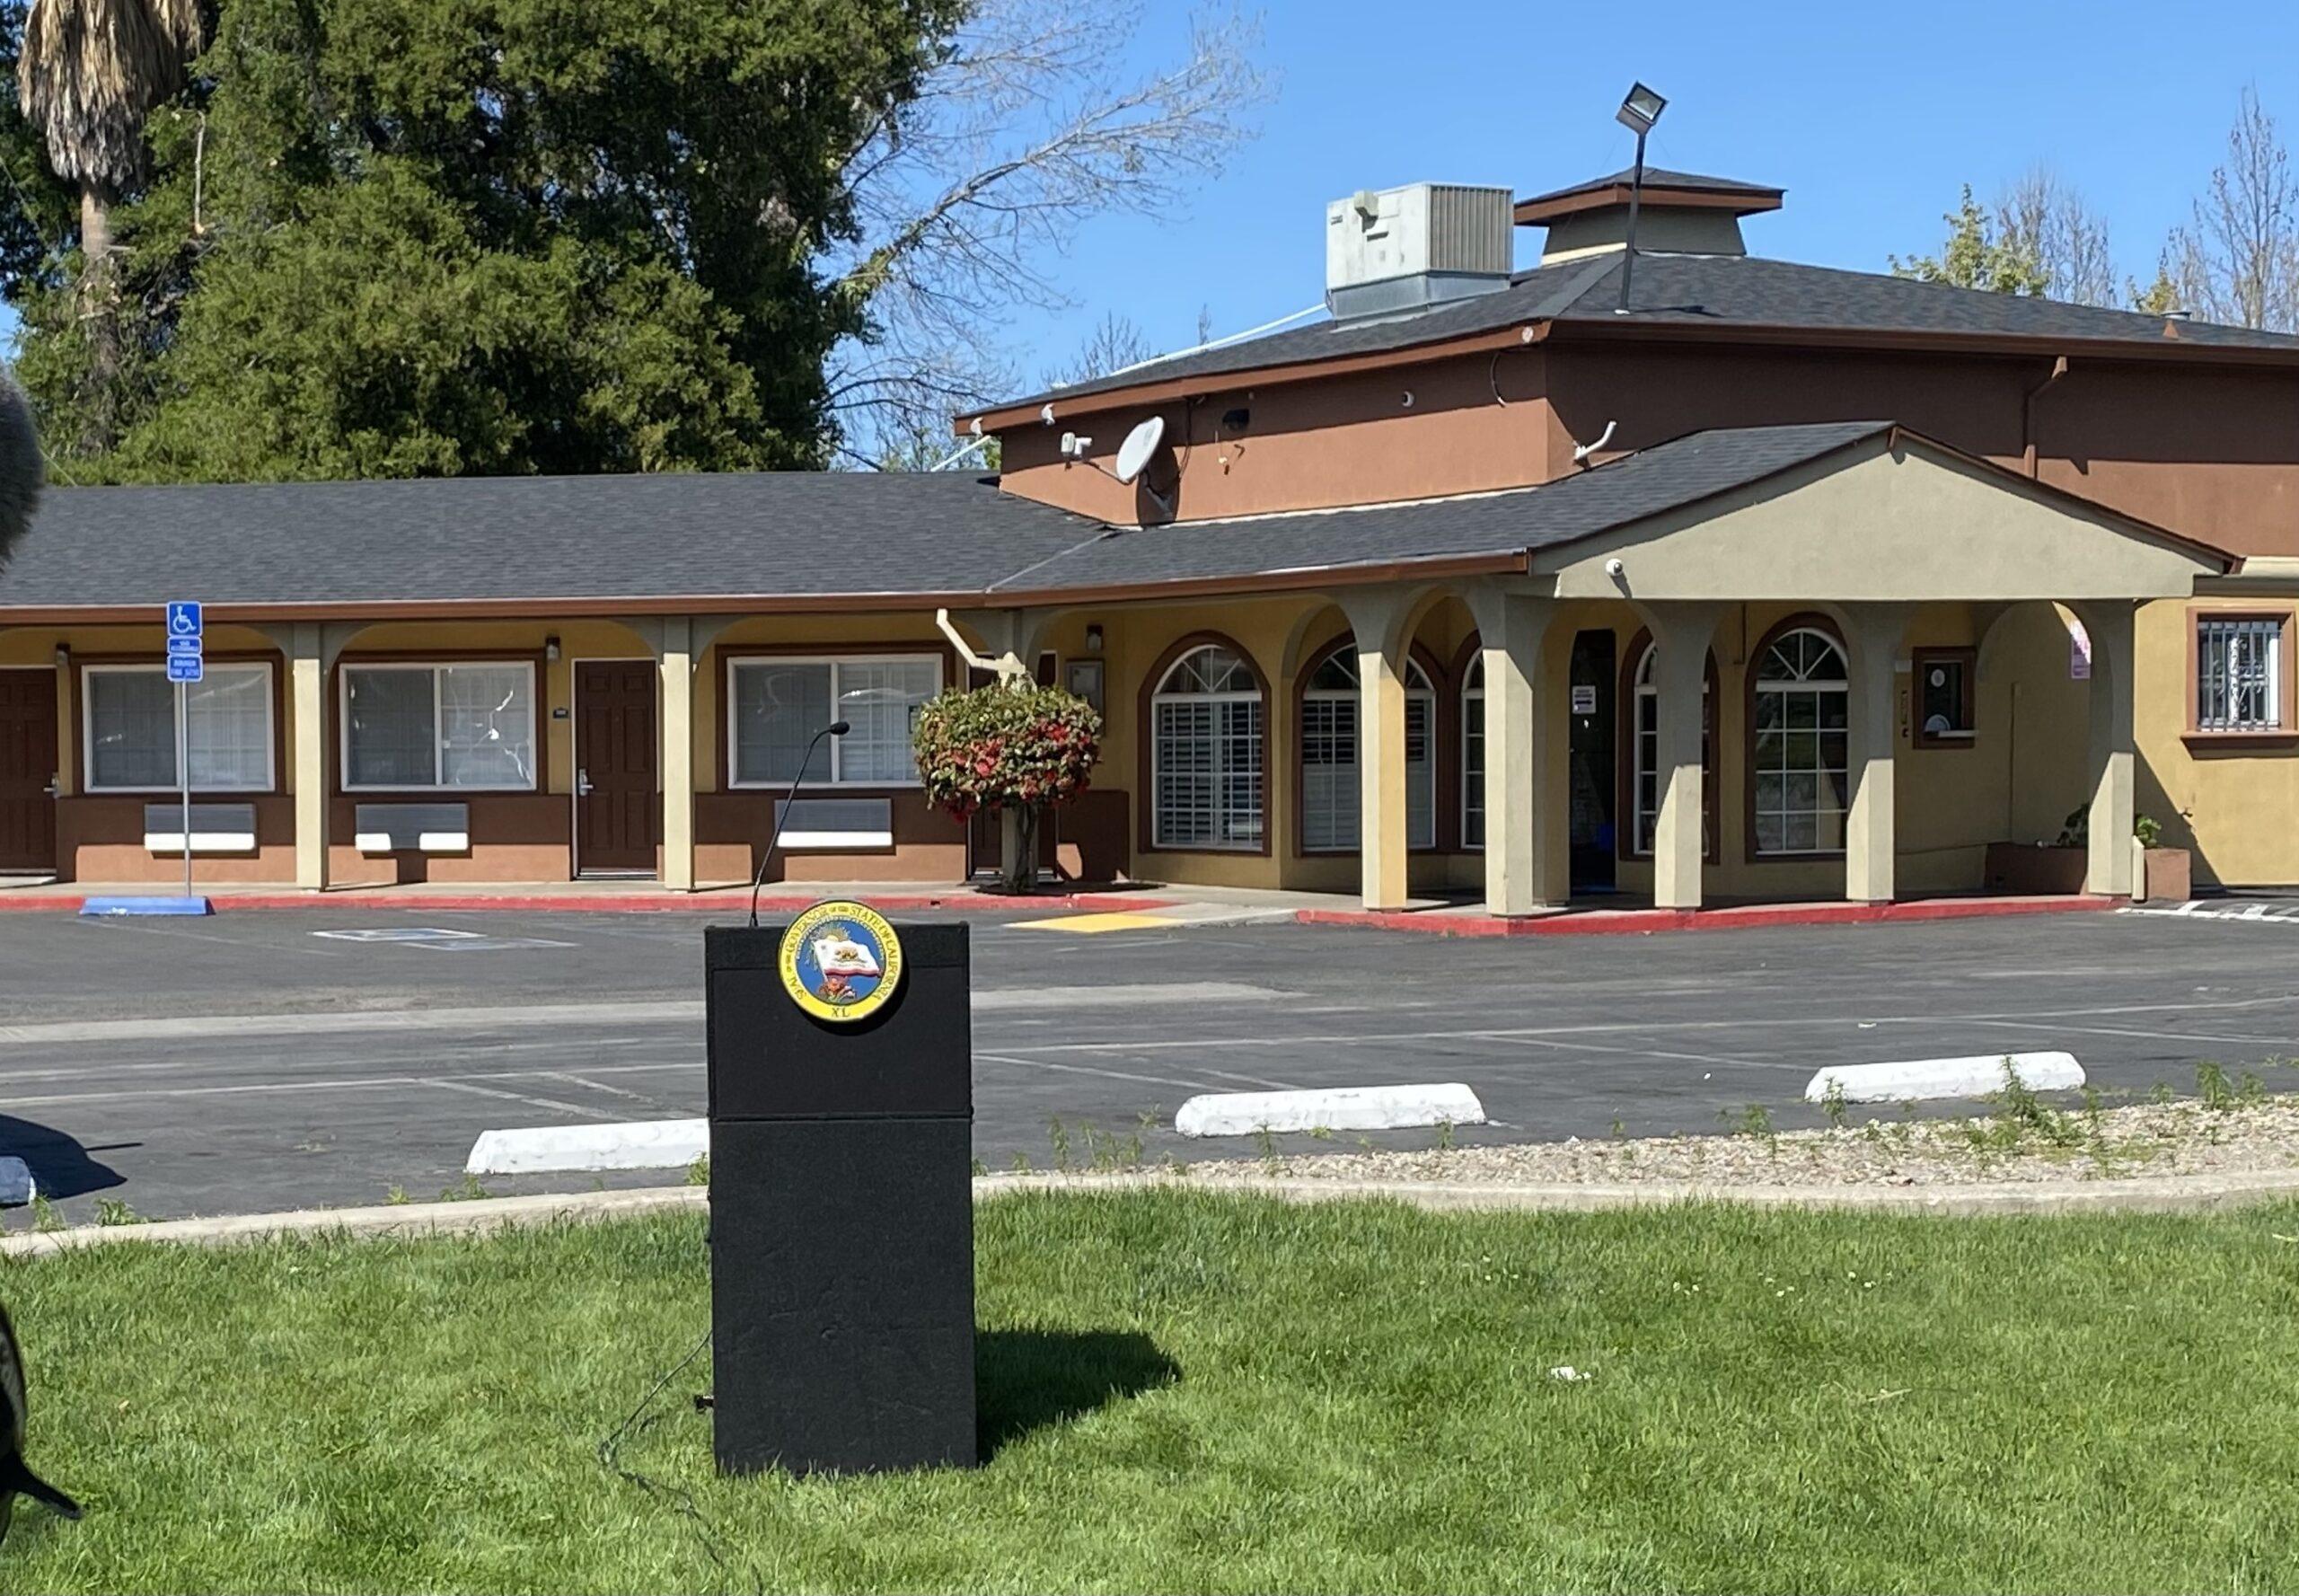 Homekey: Transforming California Hotels and Motels into Permanent Homeless Housing